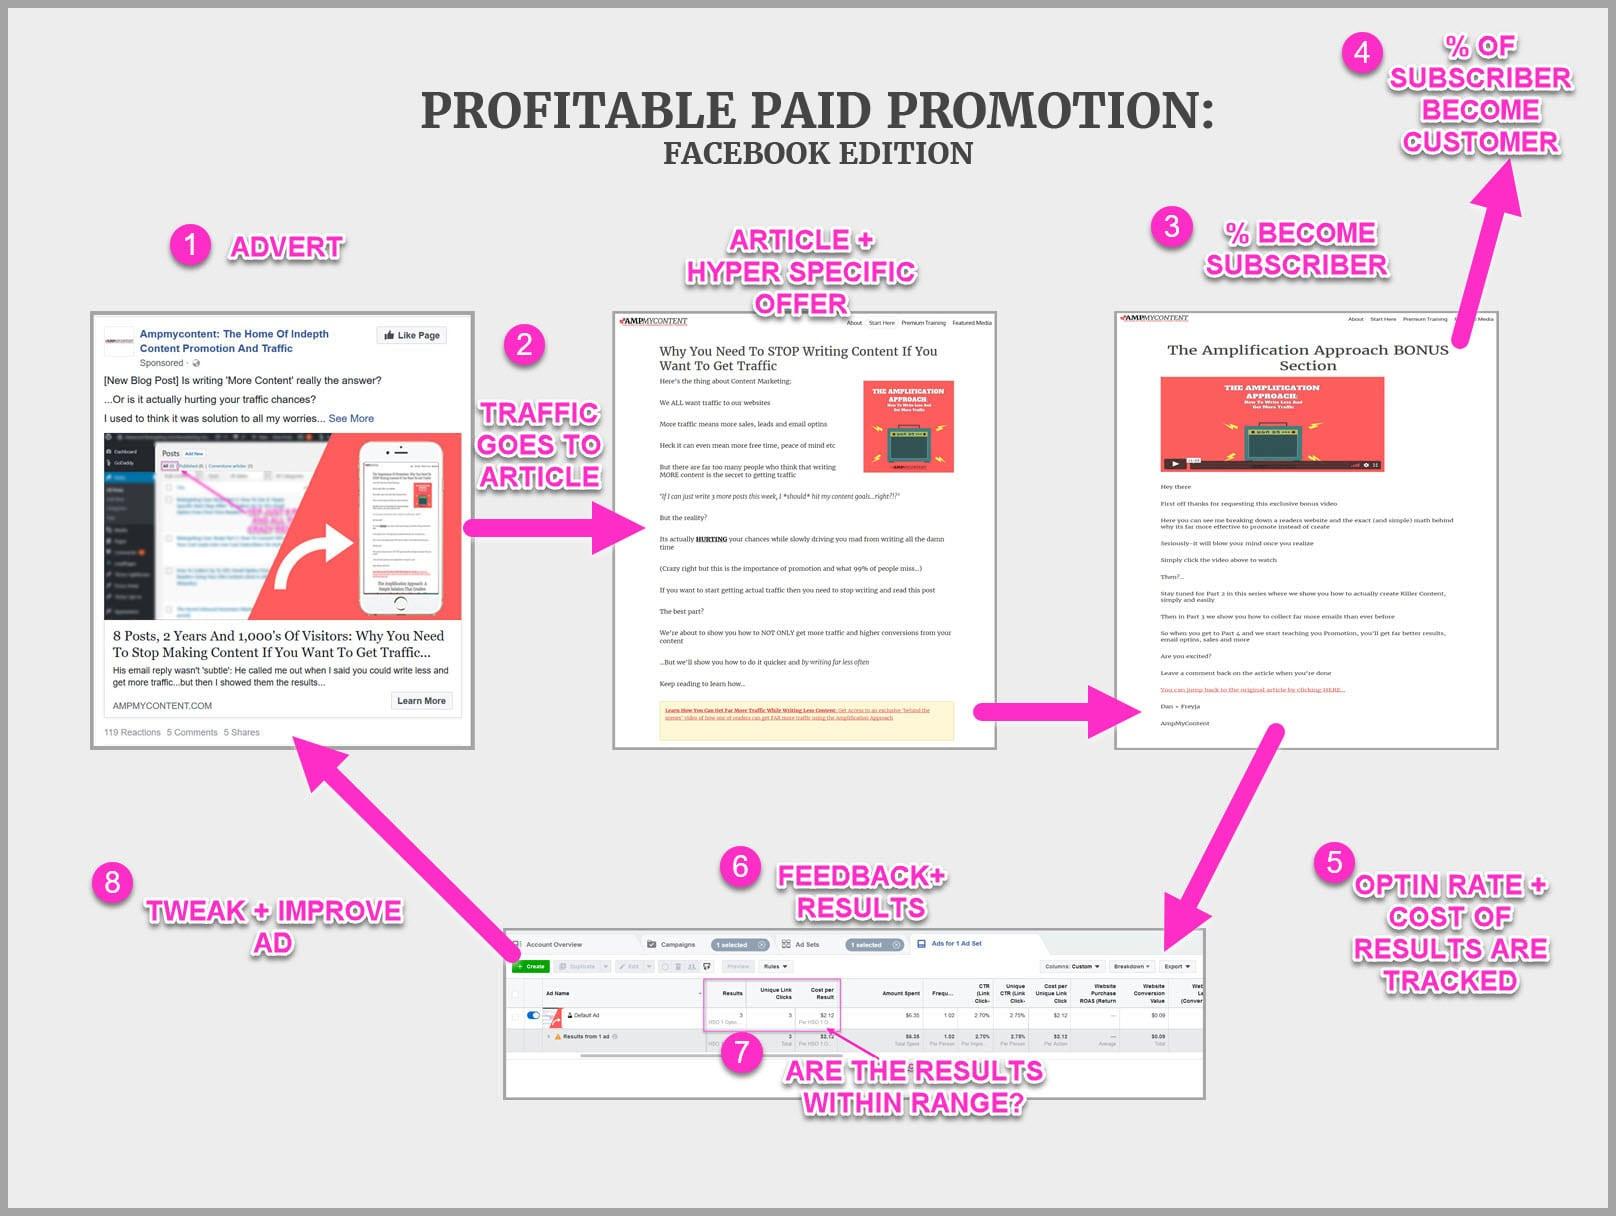 Profitable Paid Promotion